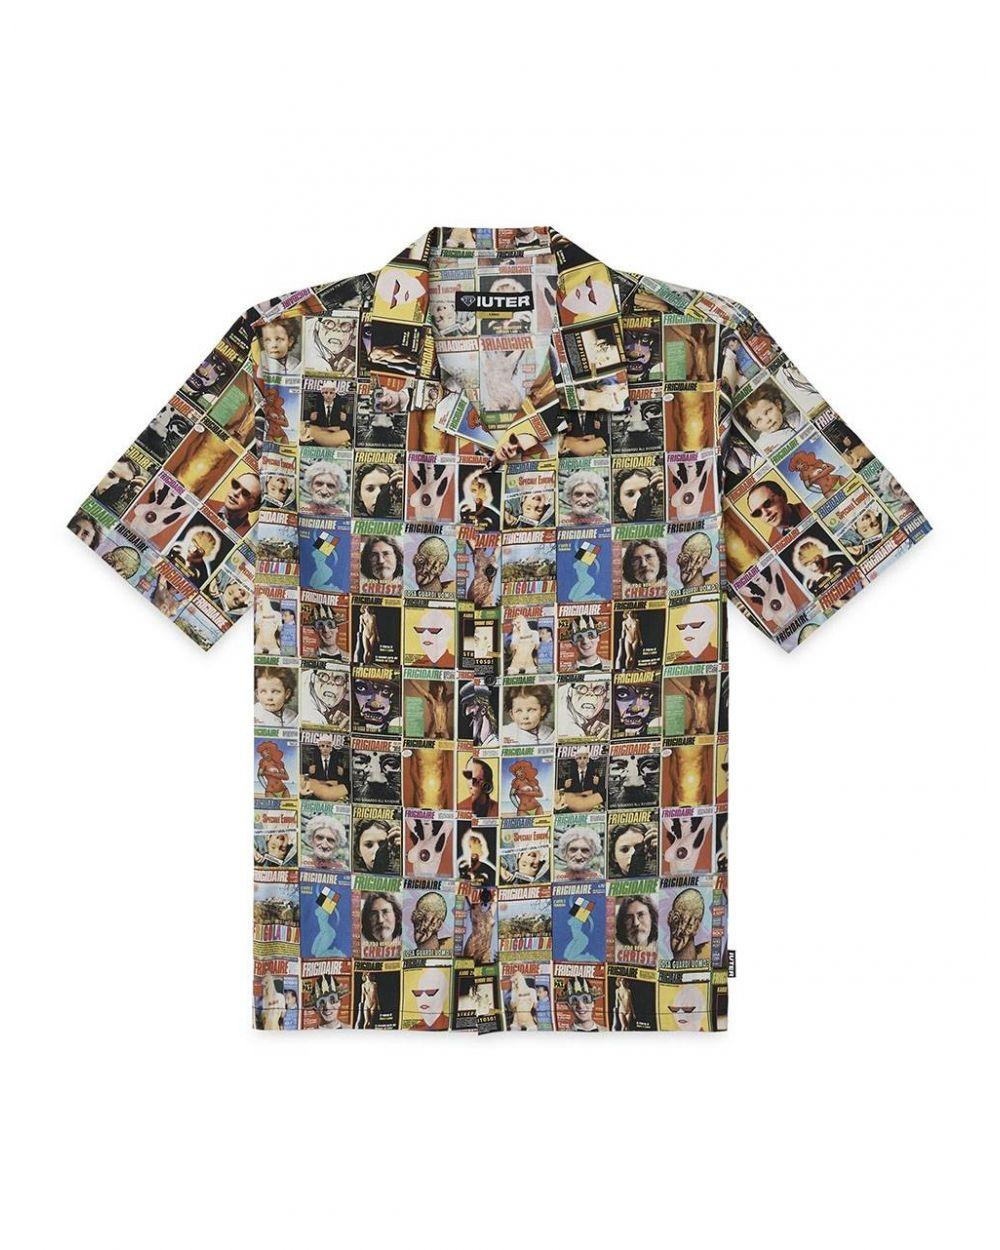 Iuter Frigidaire cover cuban shirt - multicolor IUTER Shirt 83,61€